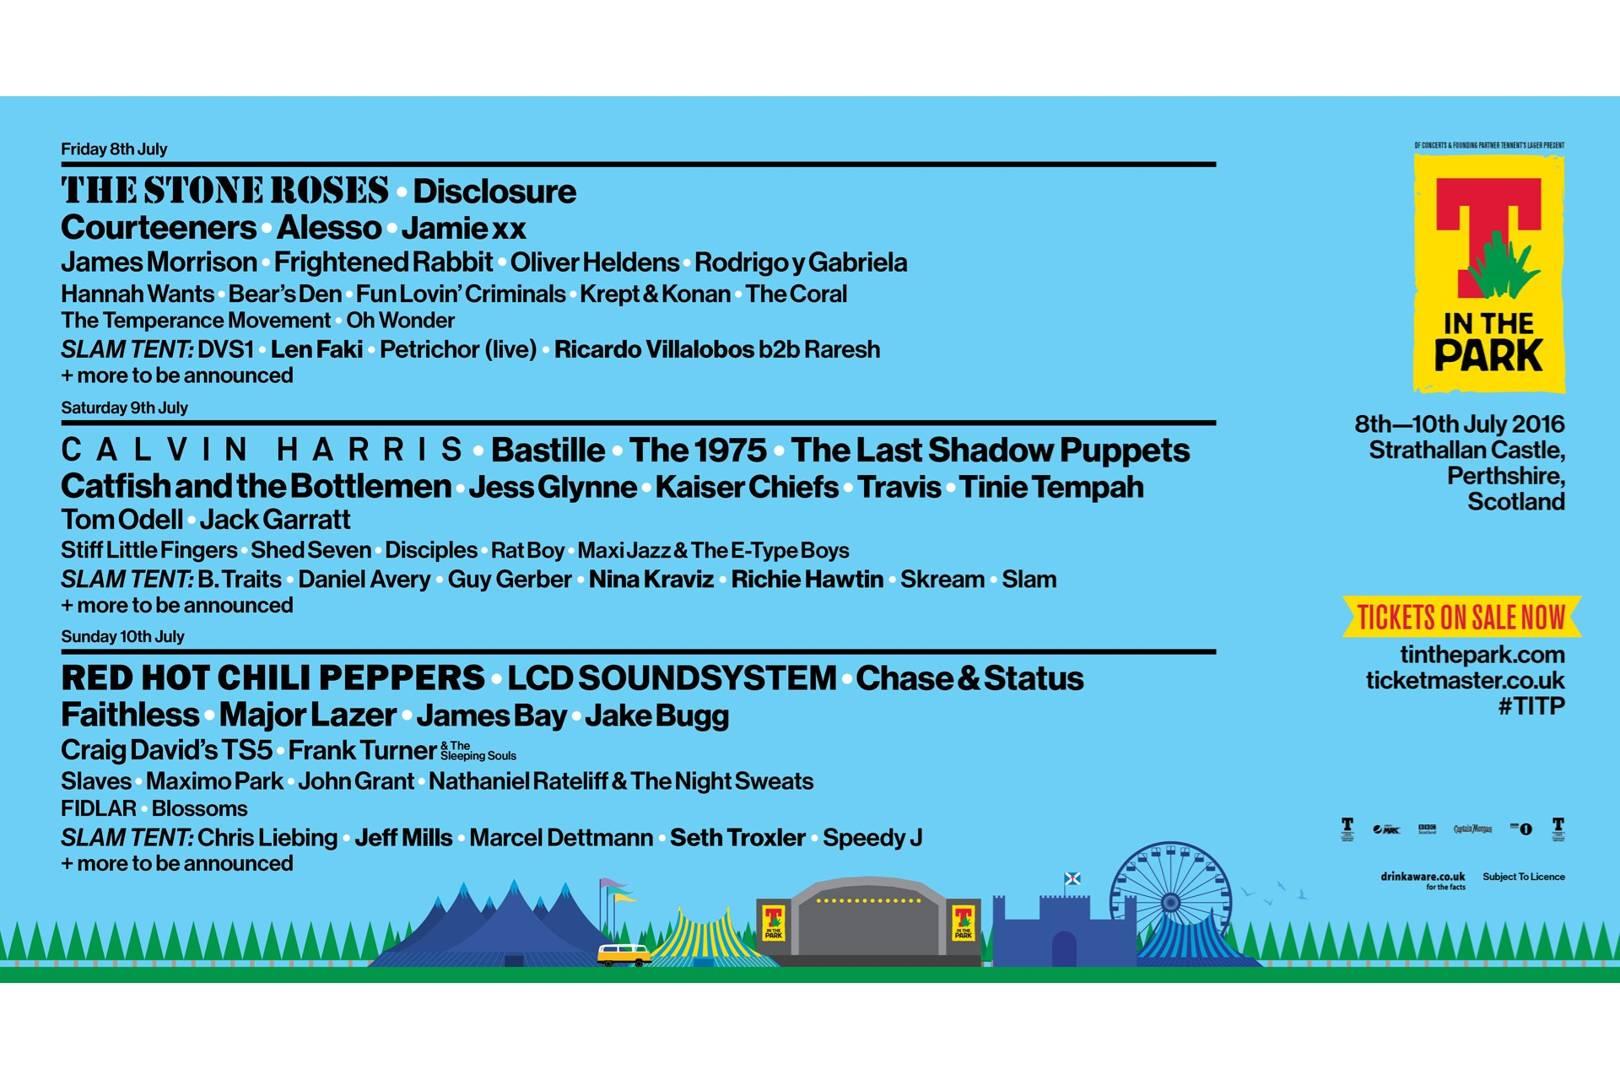 Festival Line Ups 2016 Festival Announcements Line Up Rihanna